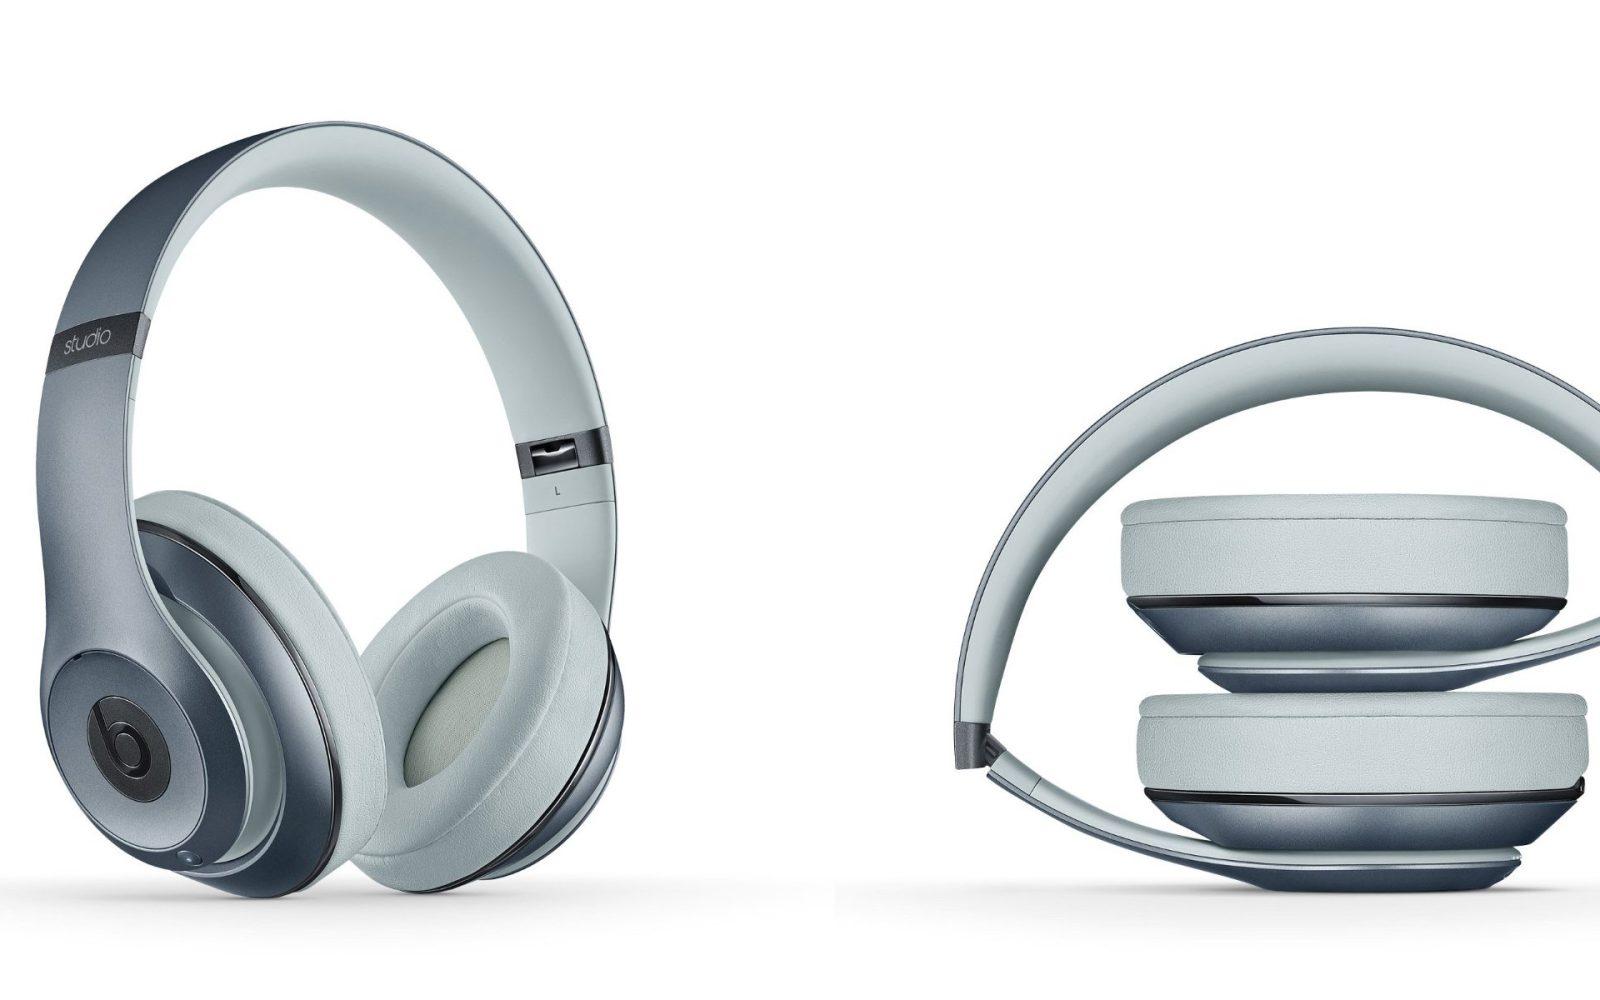 1684a70ed1d Beats Studio 2.0 Over-Ear headphones (multiple colors) $150 shipped (Orig.  $300)